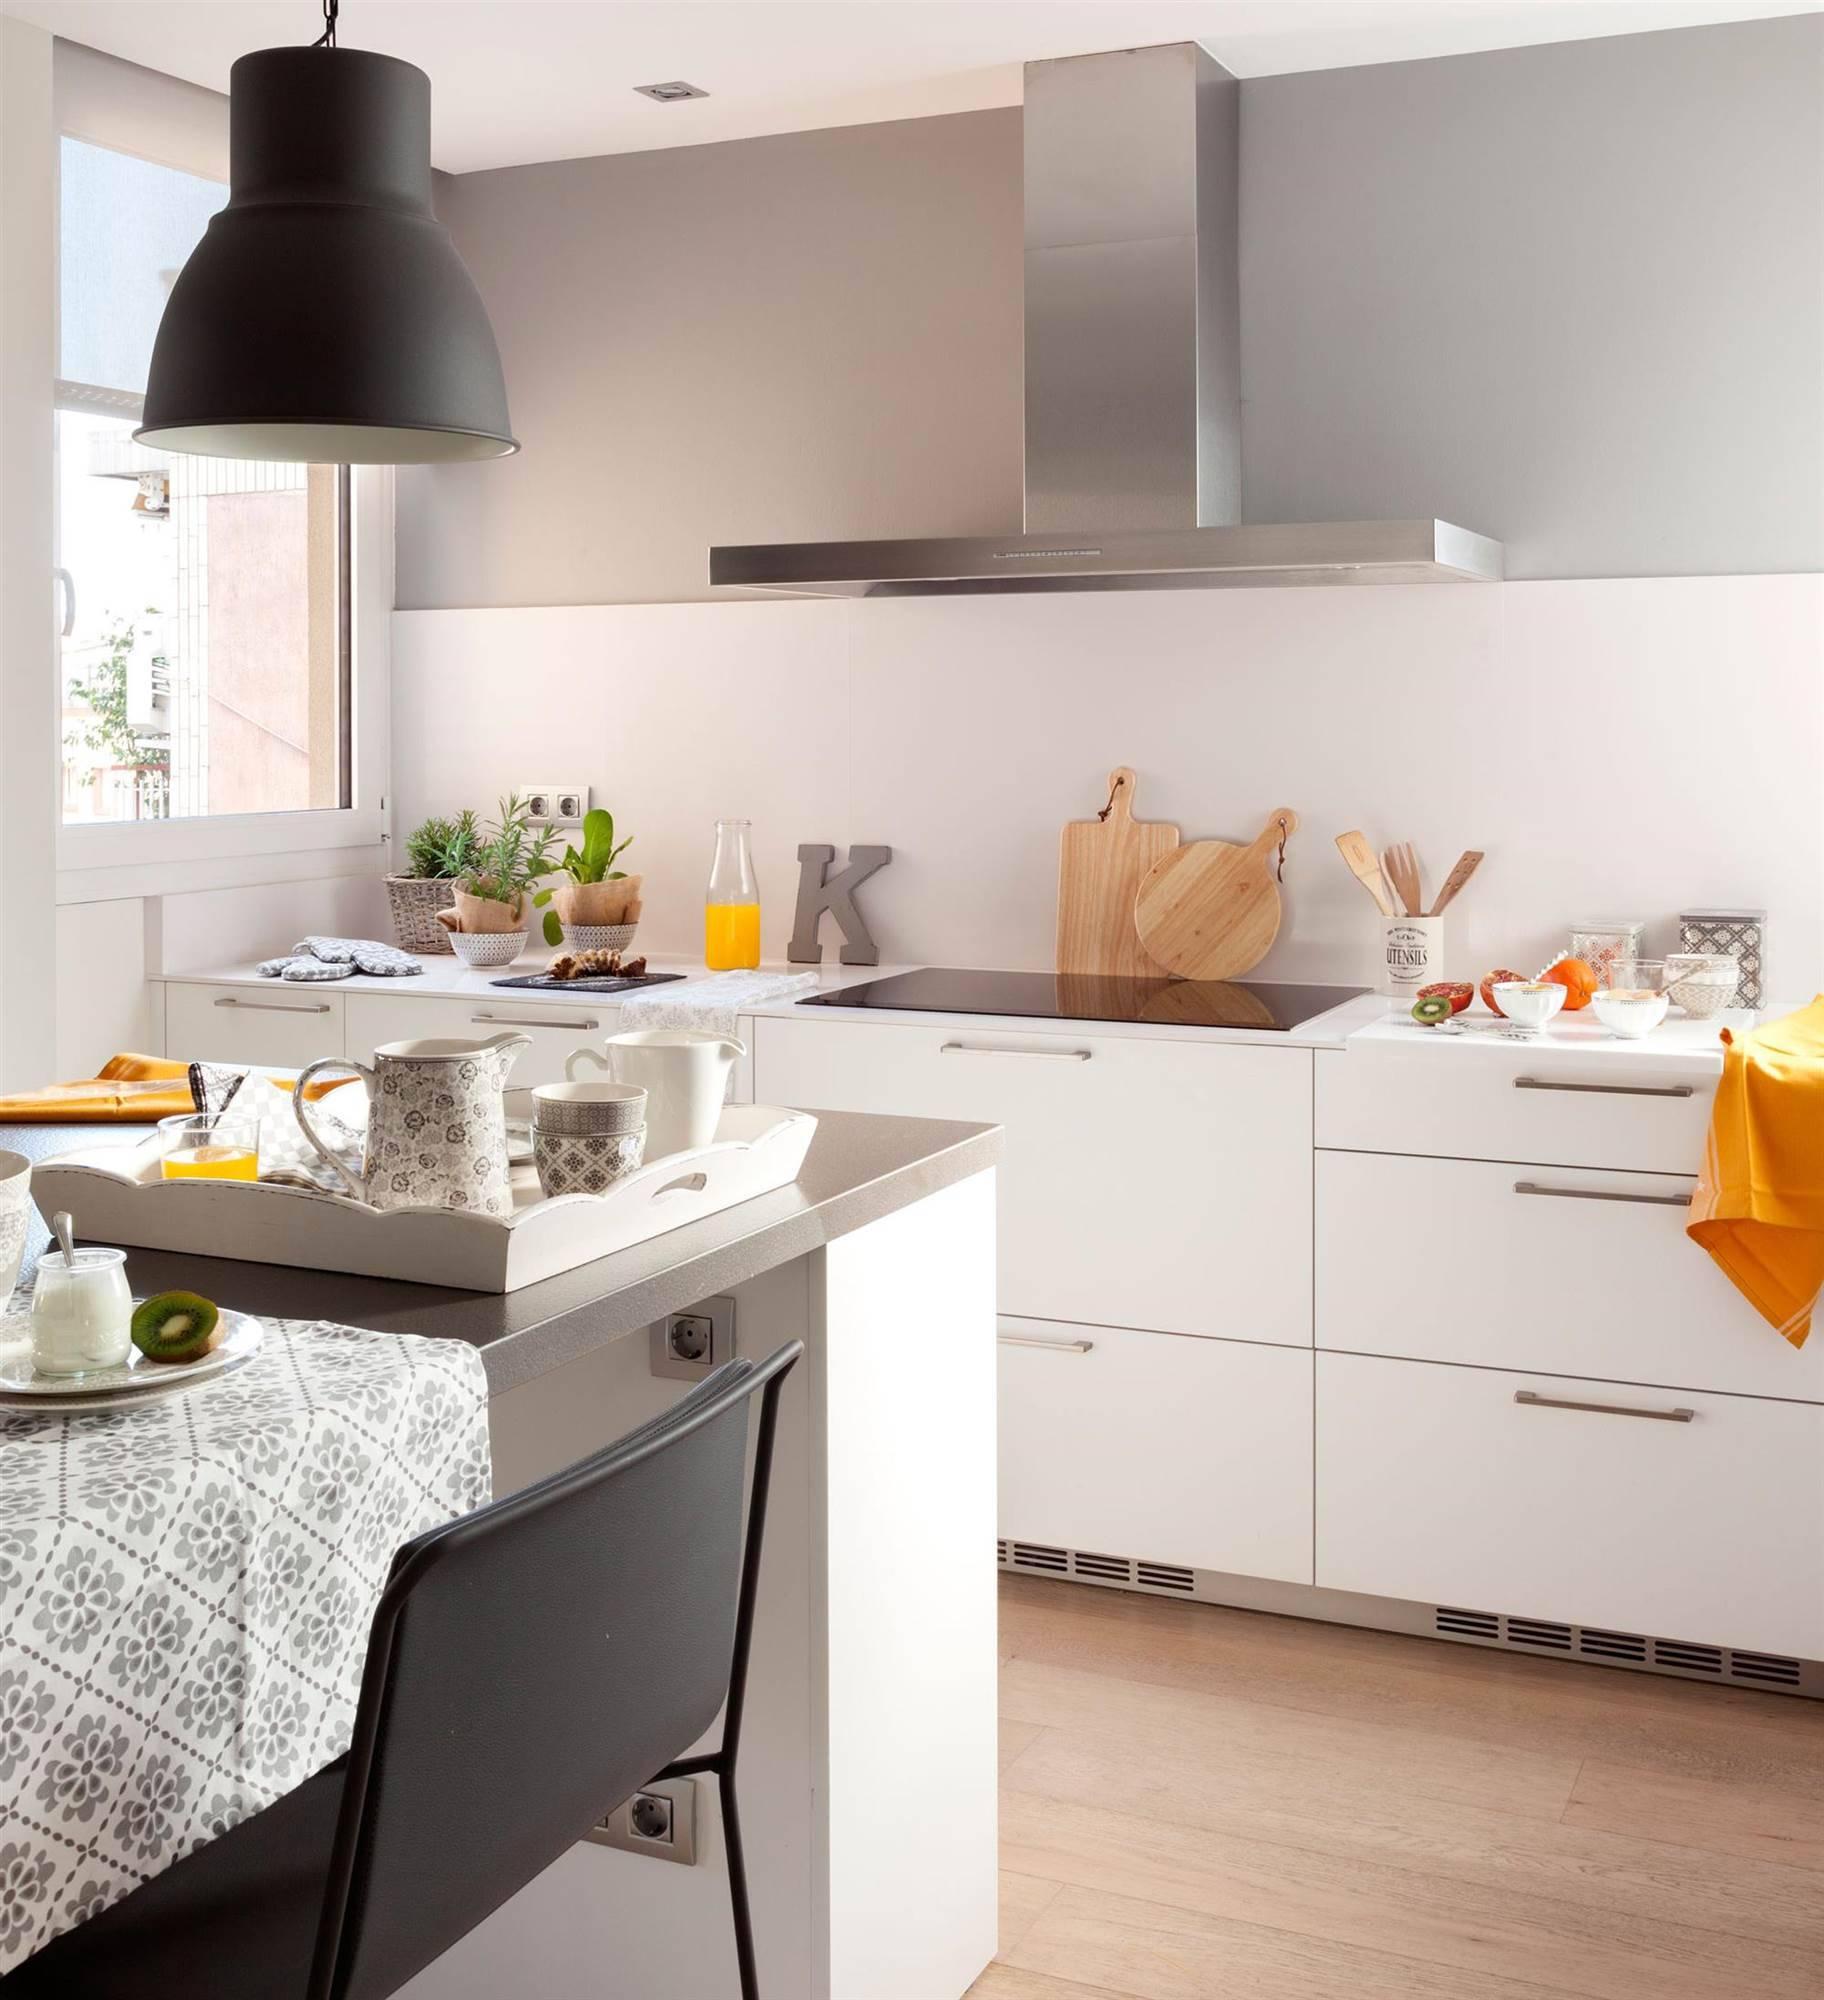 Salpicaderos Un Elemento Discreto Pero Decisivo En Tu Cocina